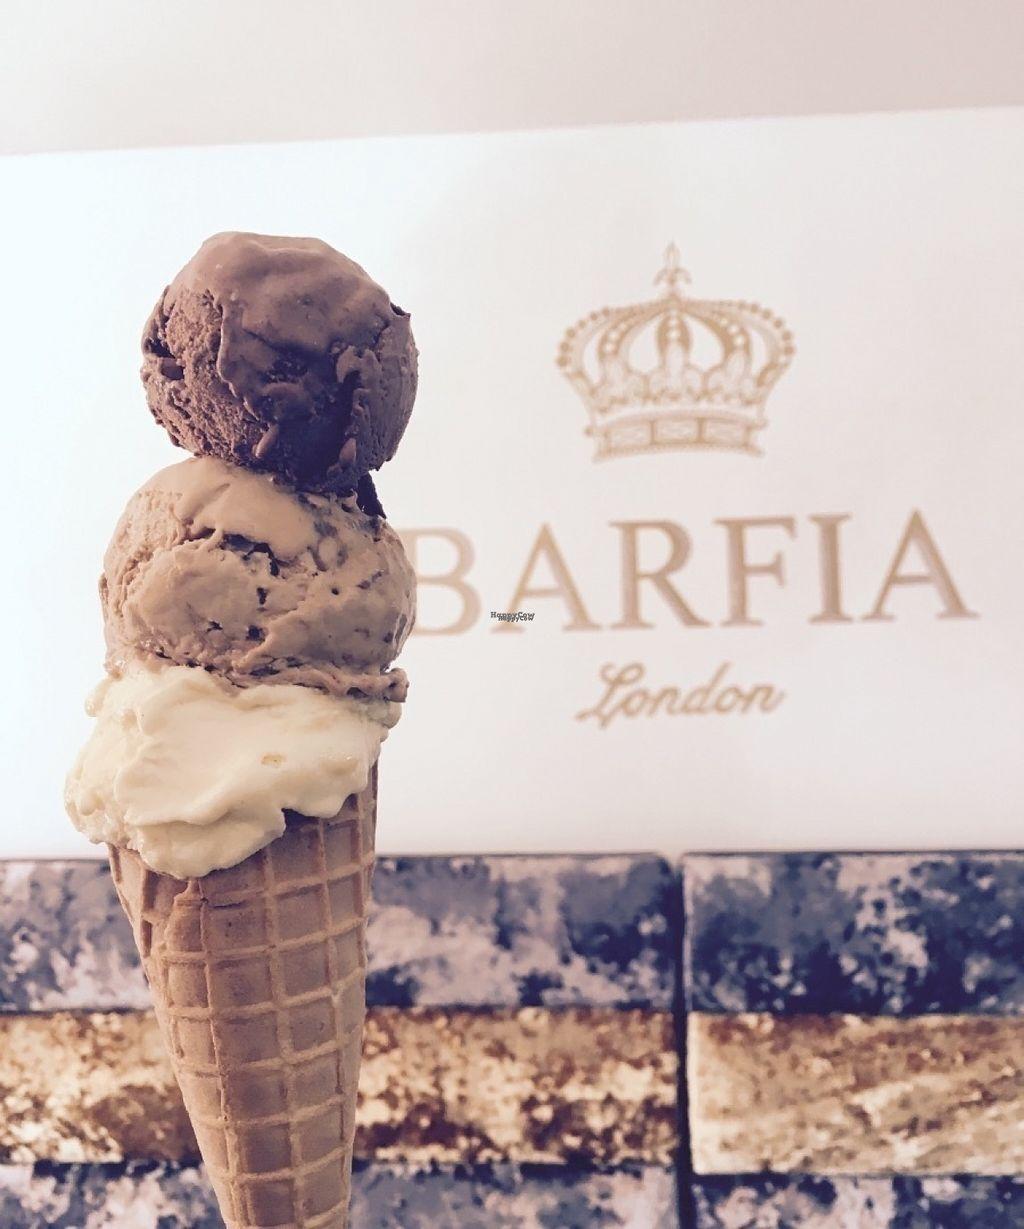 Barfia Wolverhampton Bakery Happycow